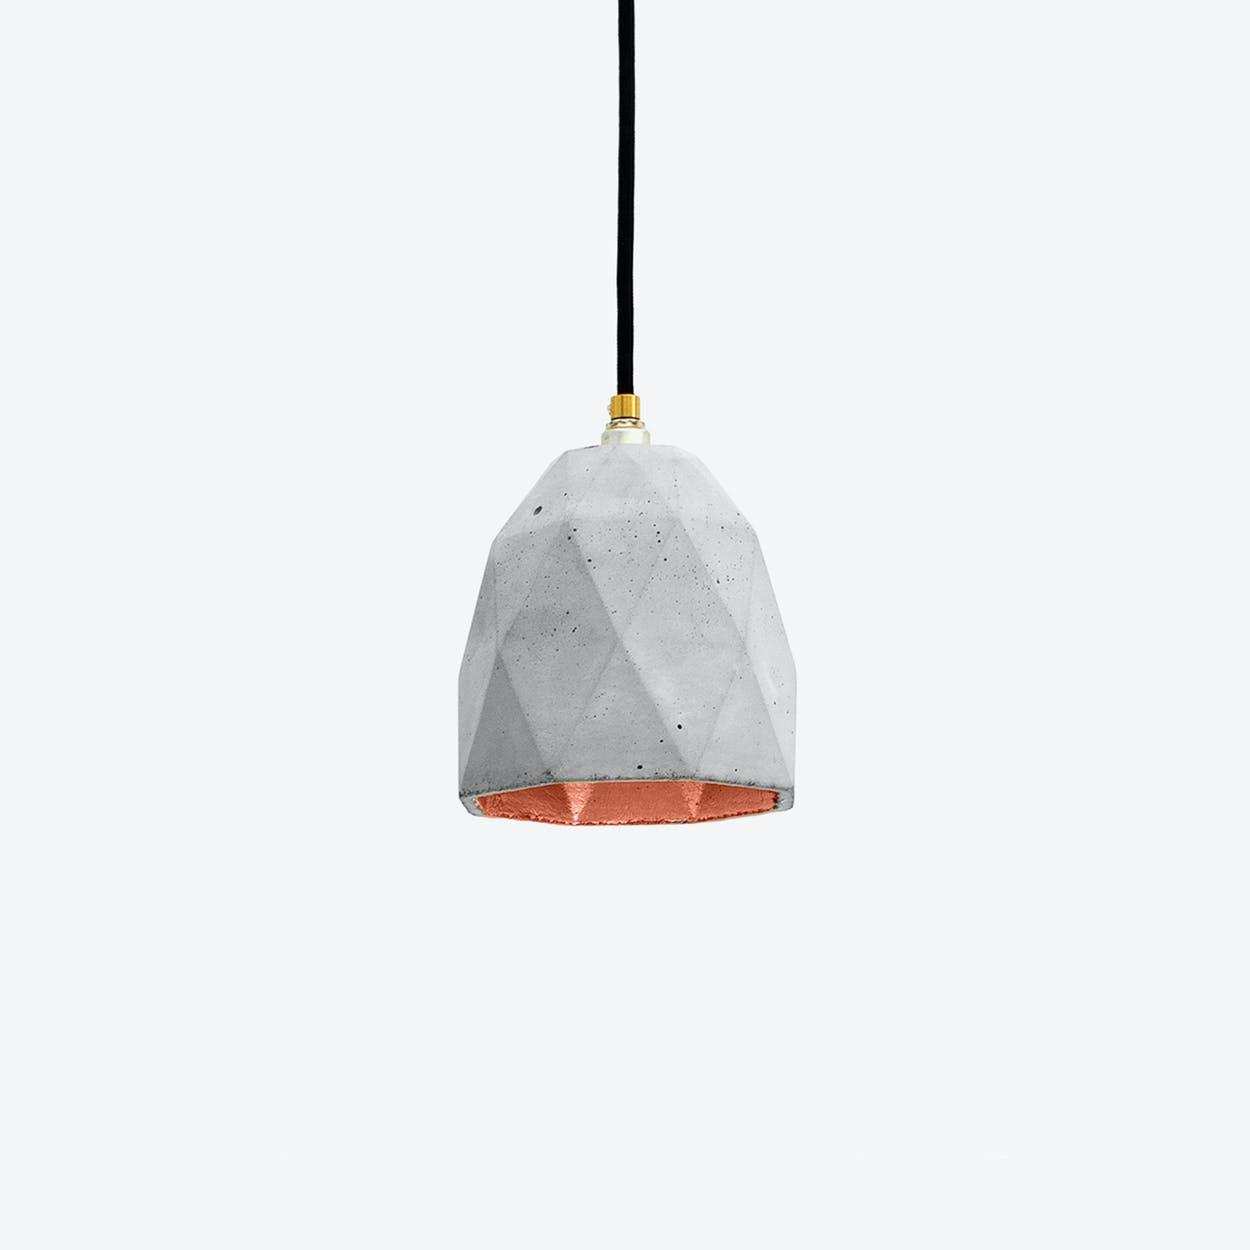 Concrete Pendant Light Triangle T1 in Light Grey and Copper